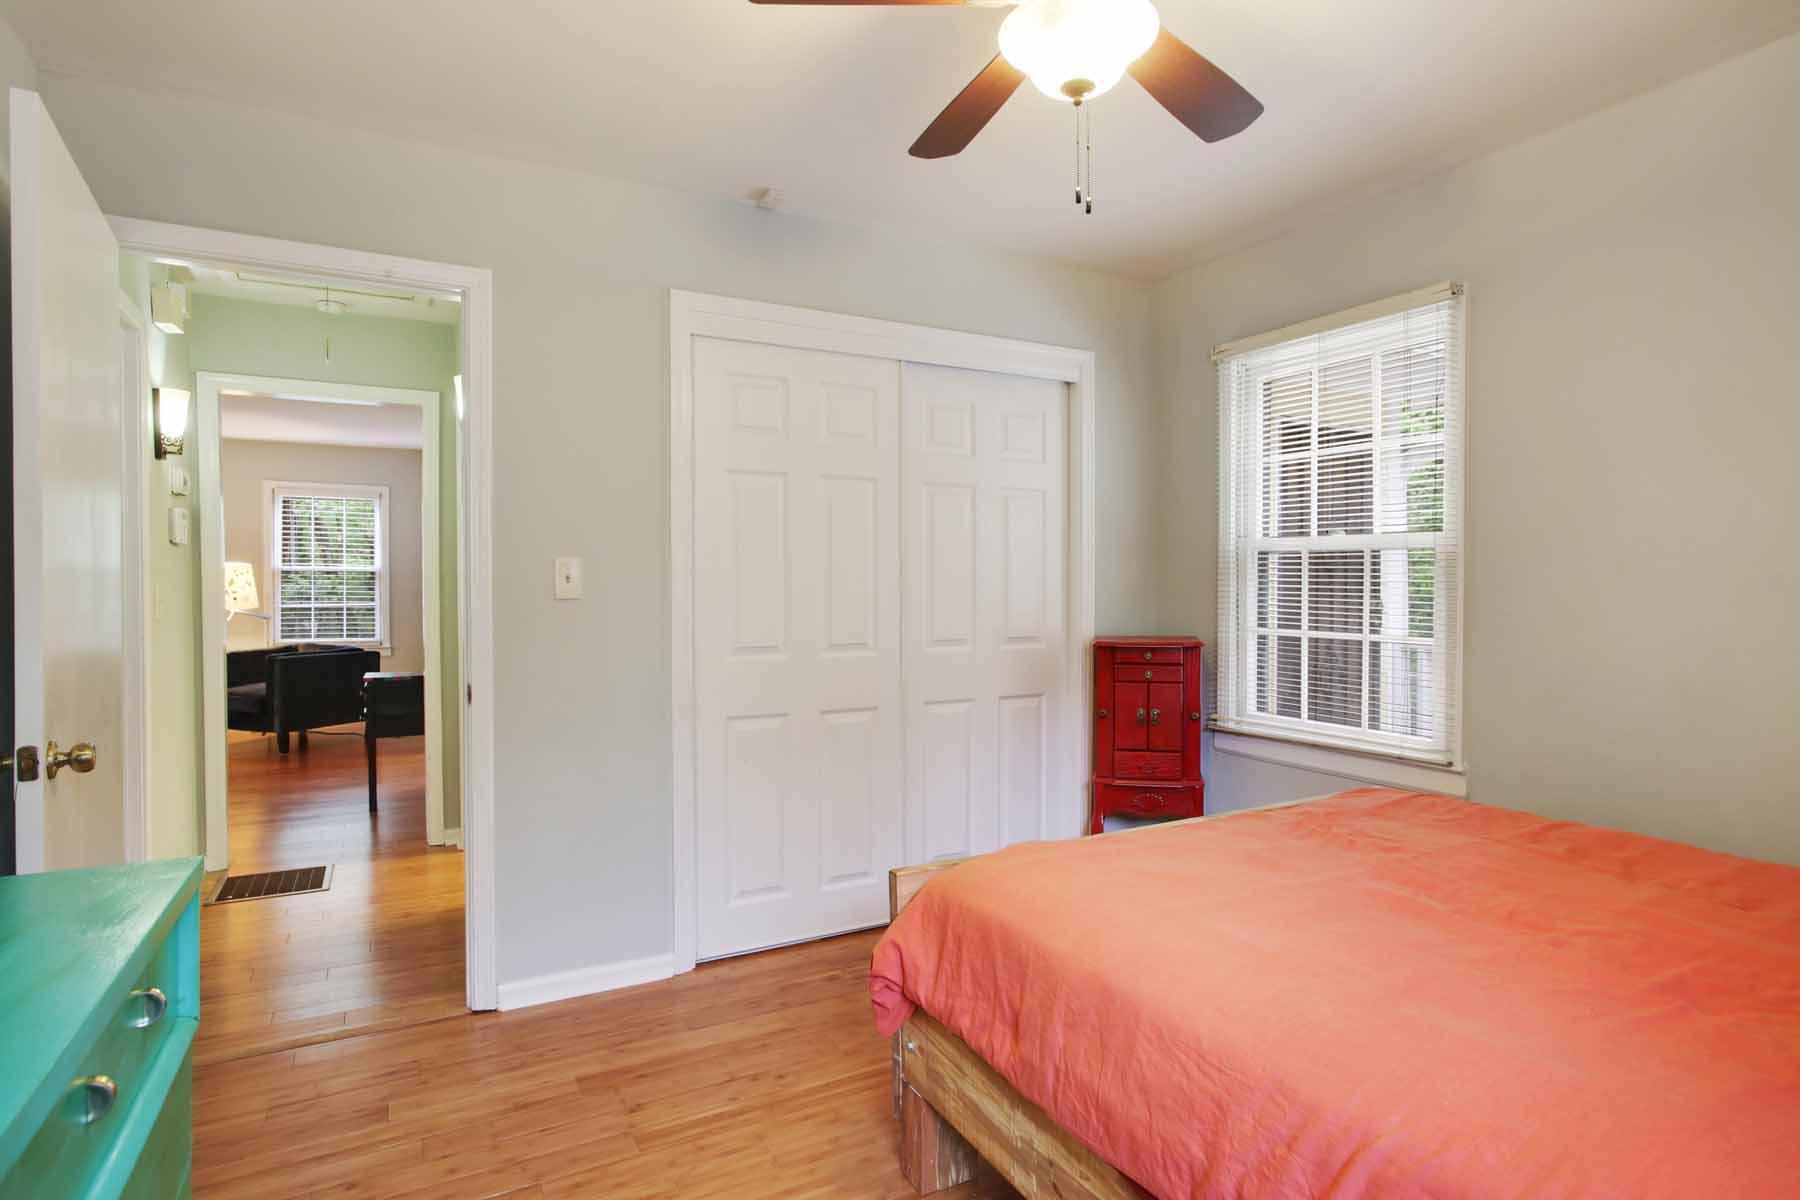 Additional photo for property listing at Amazing Value for 21 Updated Ormewood Park Bungalow! 989 Ormewood Avenue SE Atlanta, Γεωργια 30316 Ηνωμενεσ Πολιτειεσ